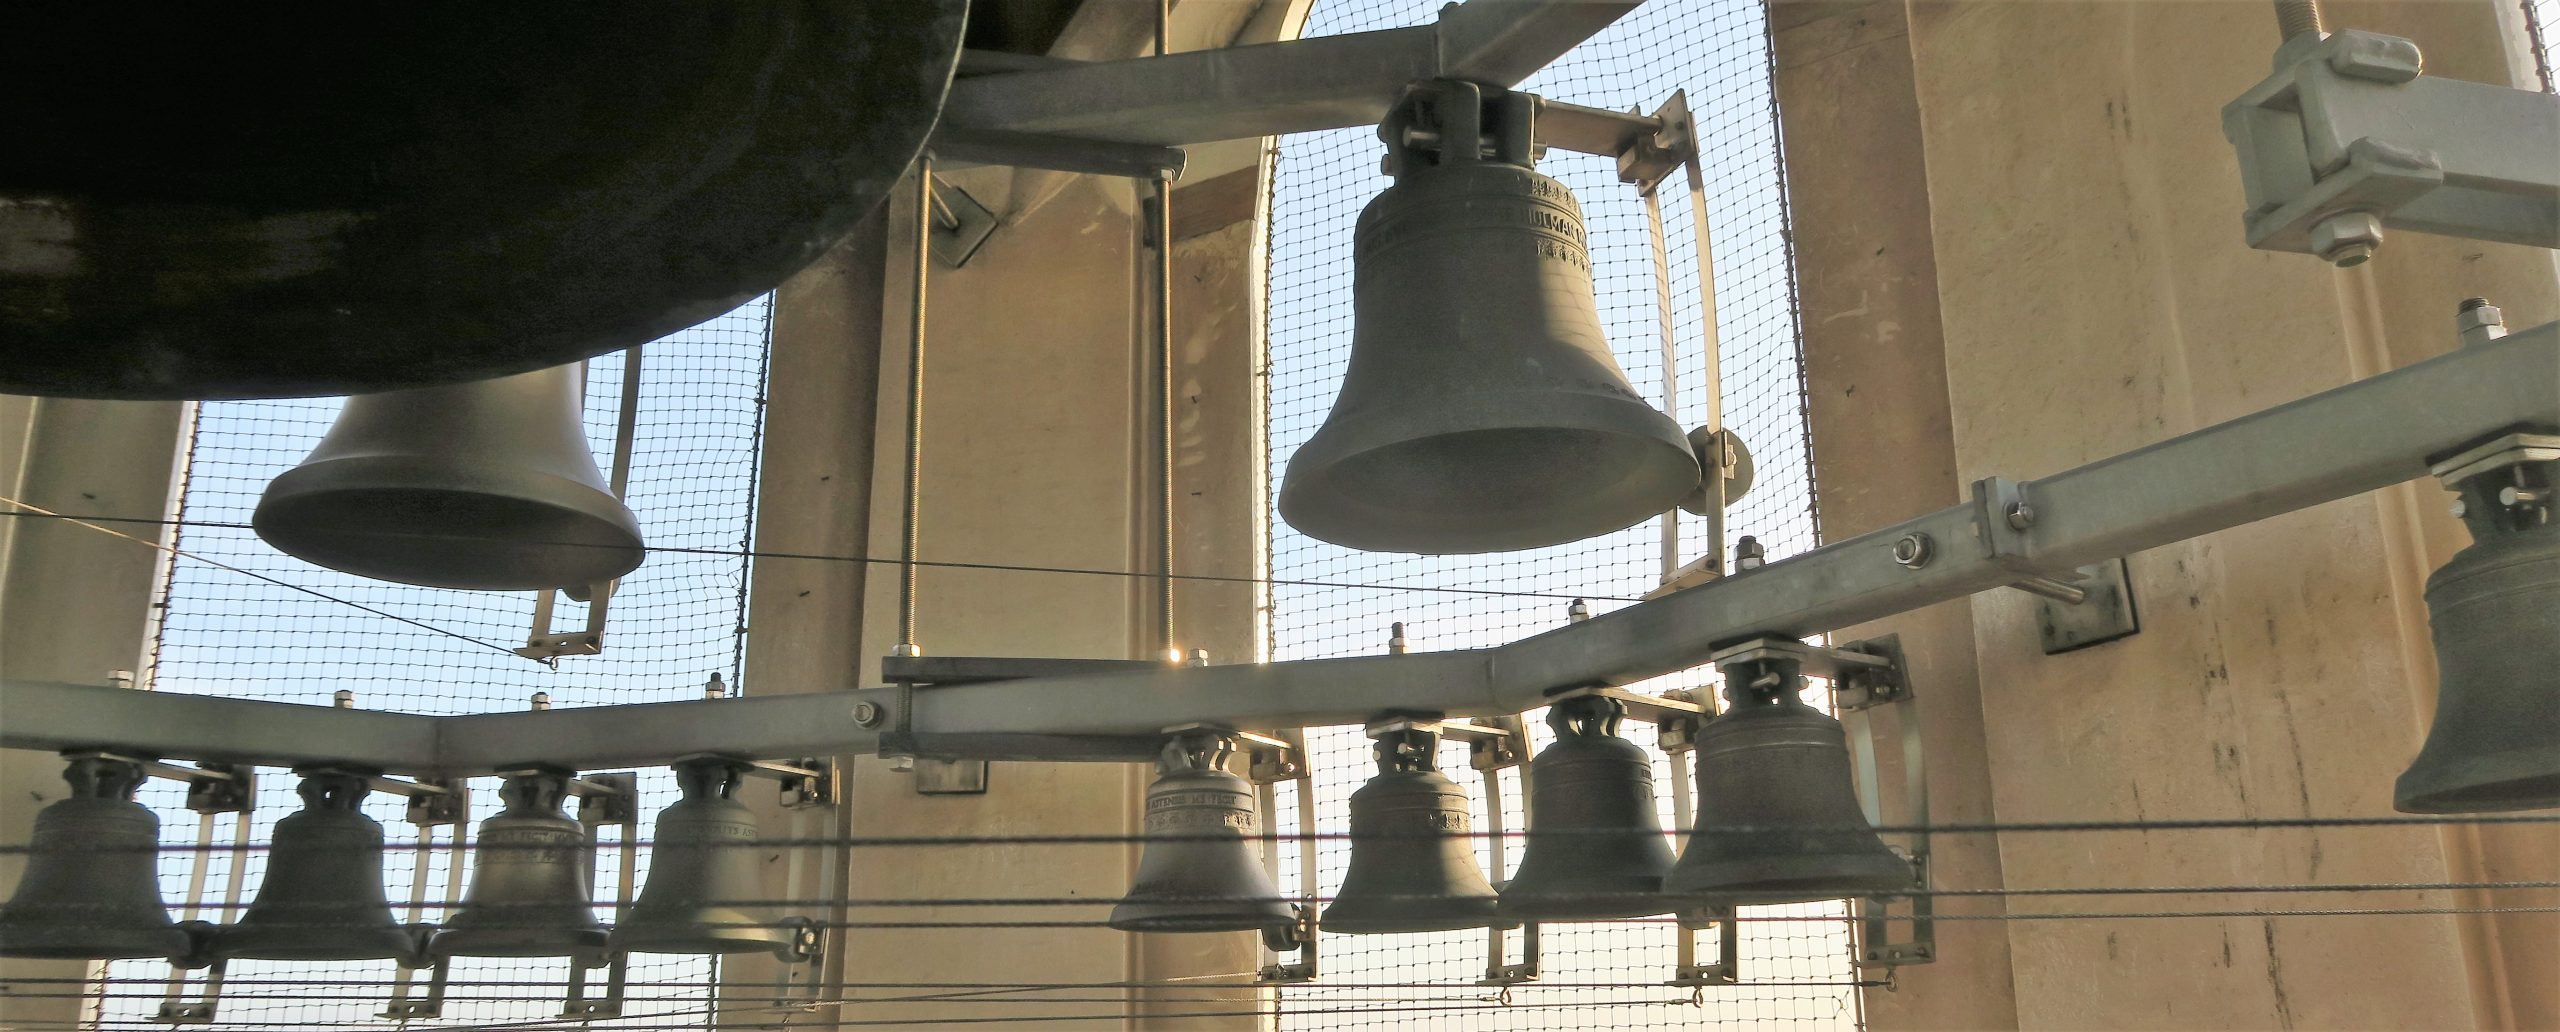 Koning Willem-Alexander Carillon Ootmarsum